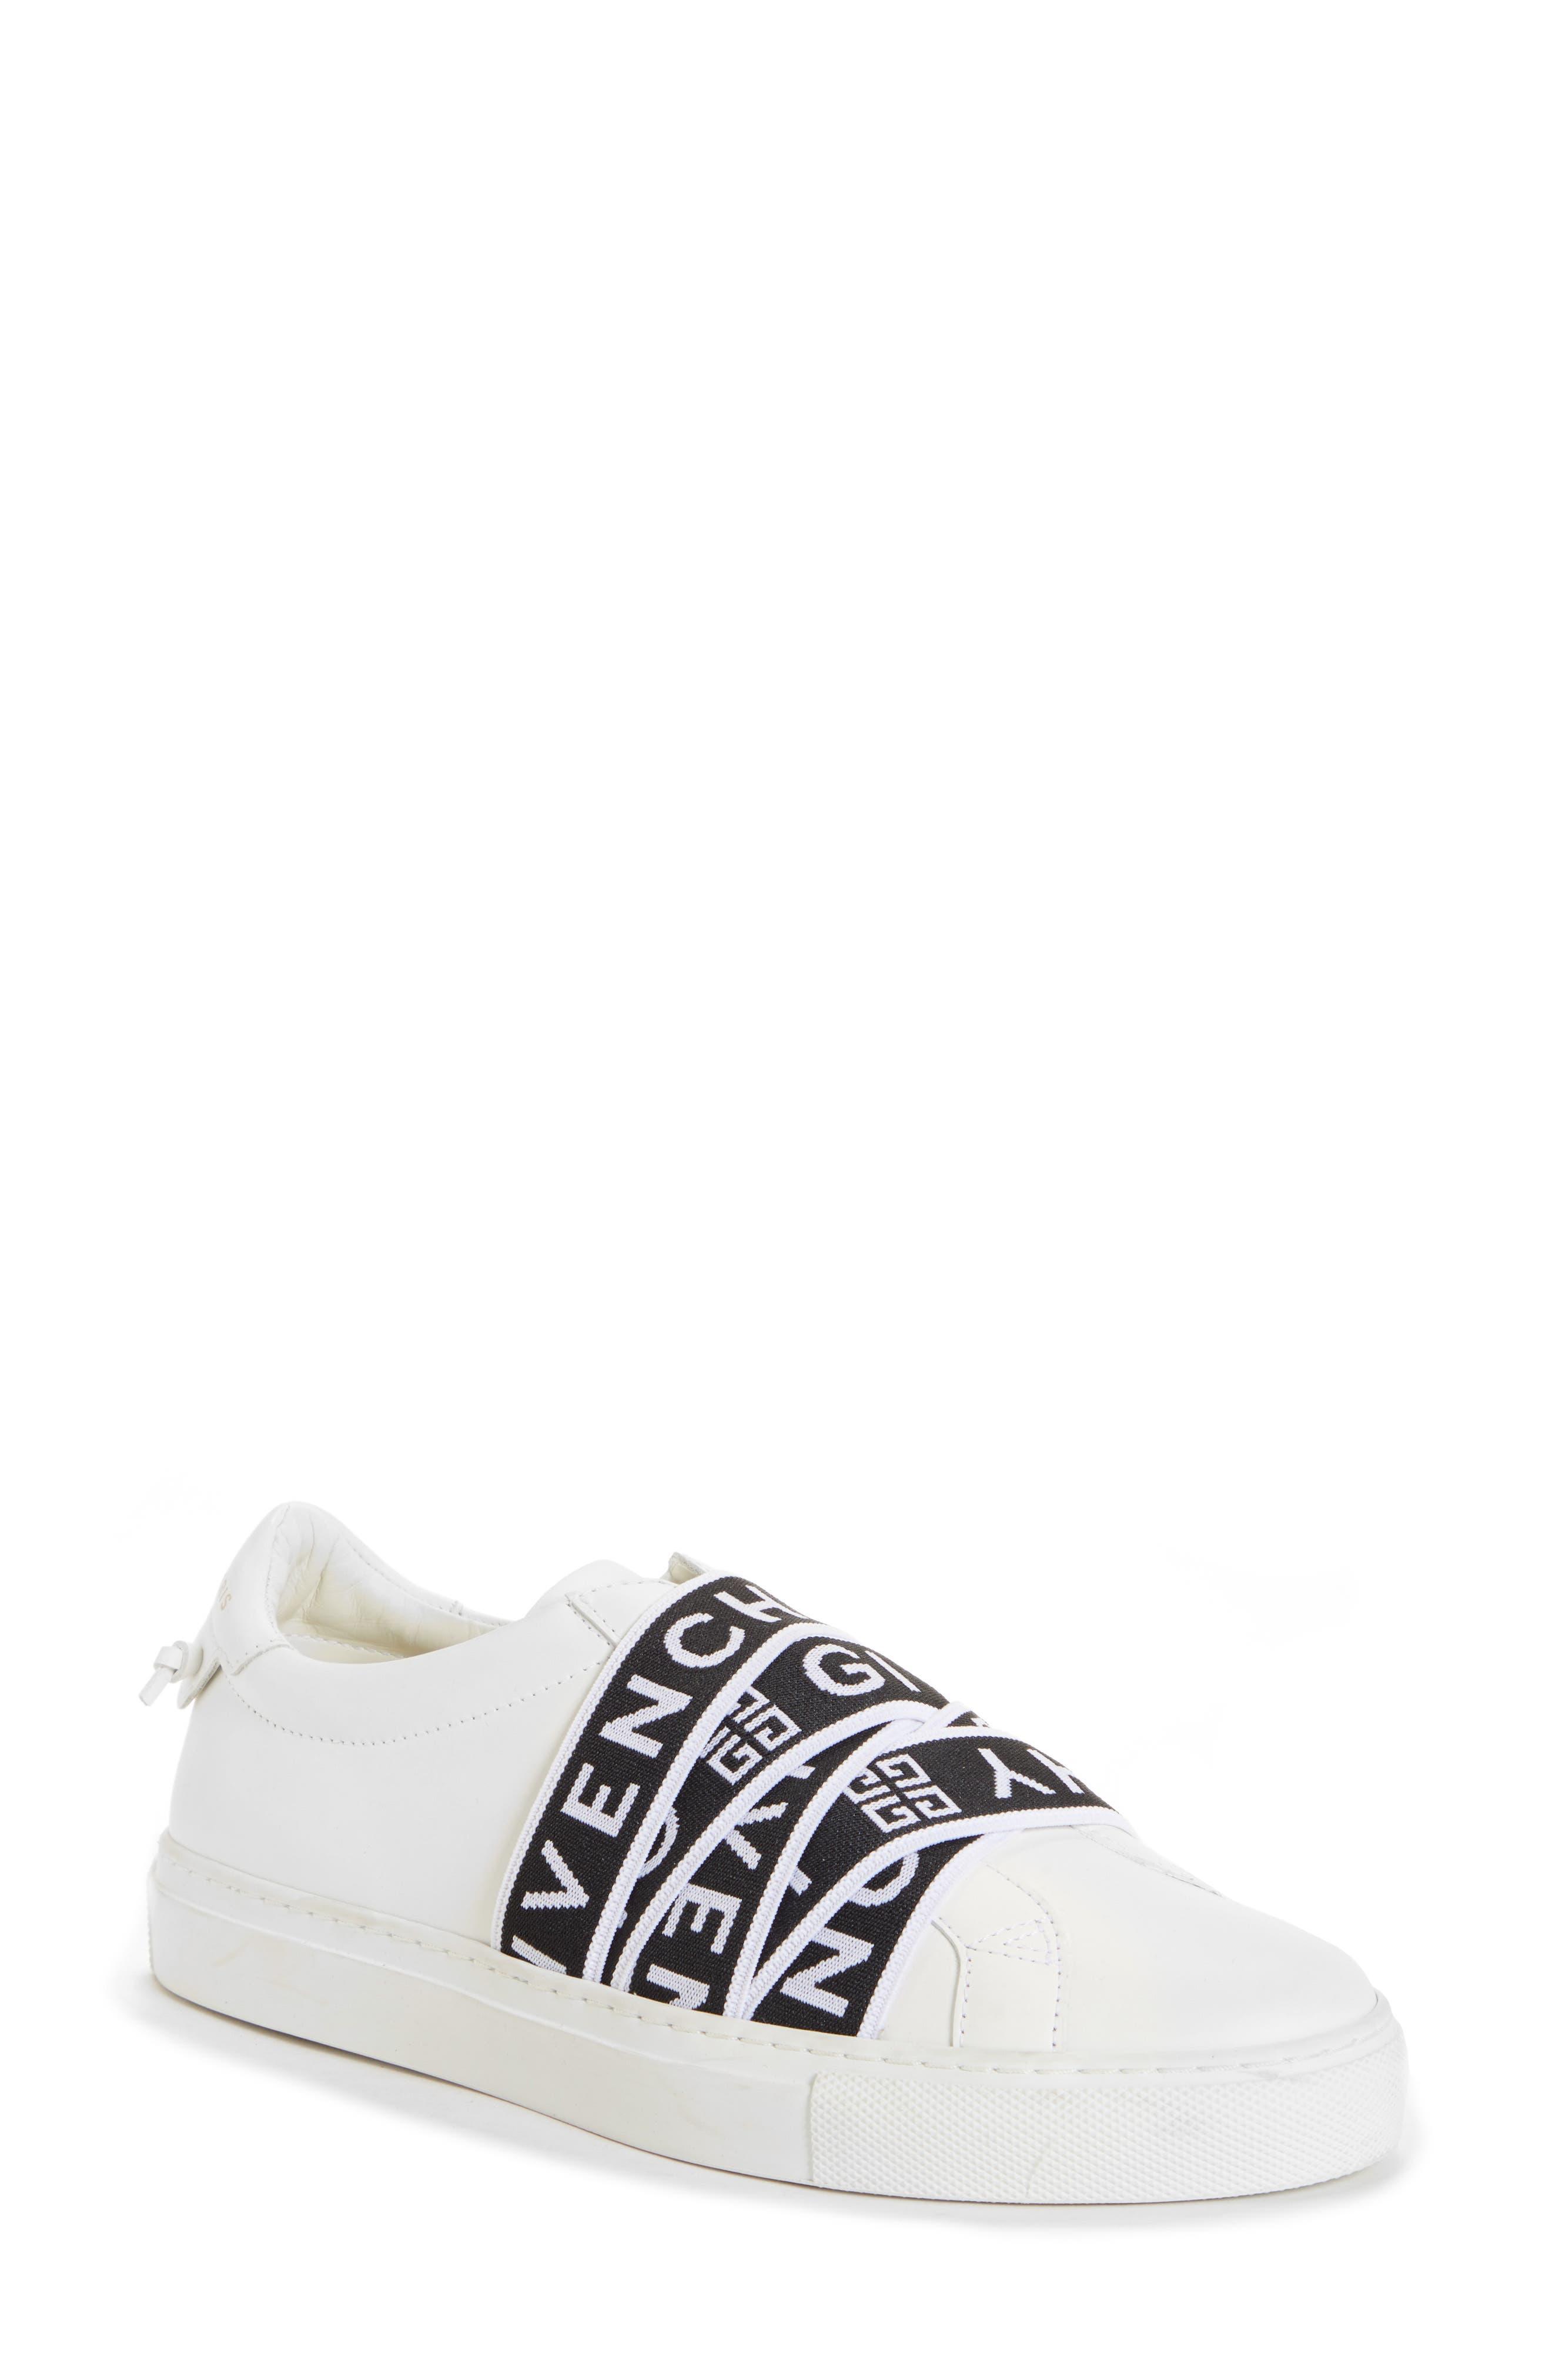 GIVENCHY Urban Street Logo Strap Sneaker, Main, color, WHITE/ BLACK